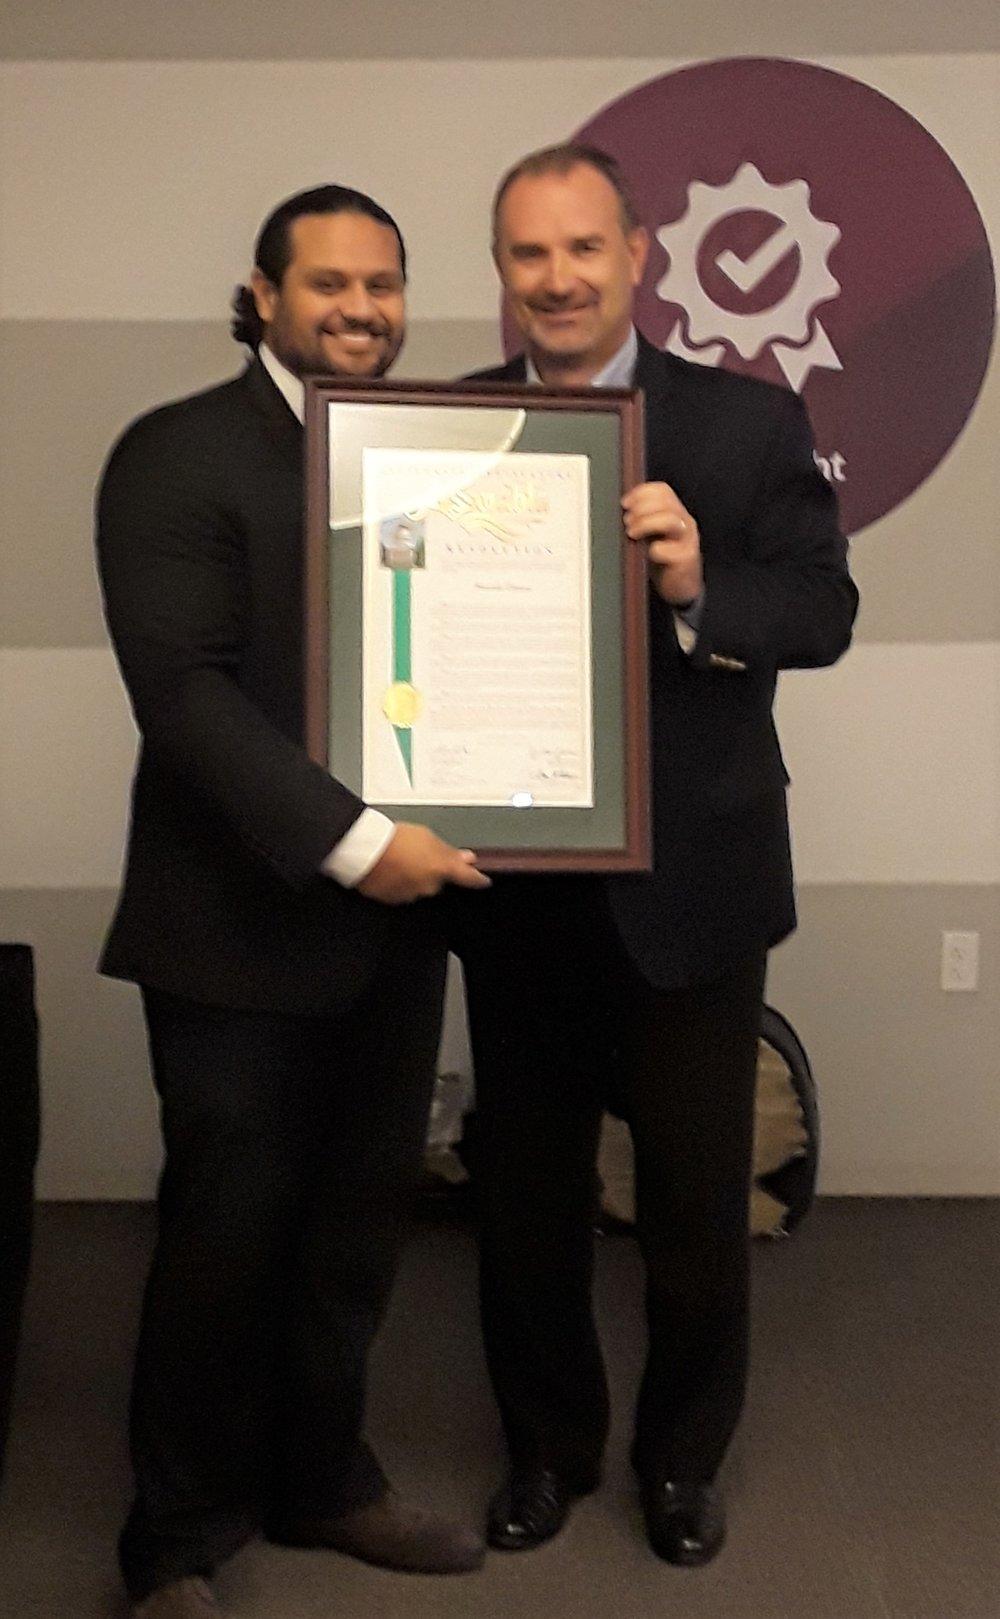 Robert and Lee Hernandez resolution presentation.jpg